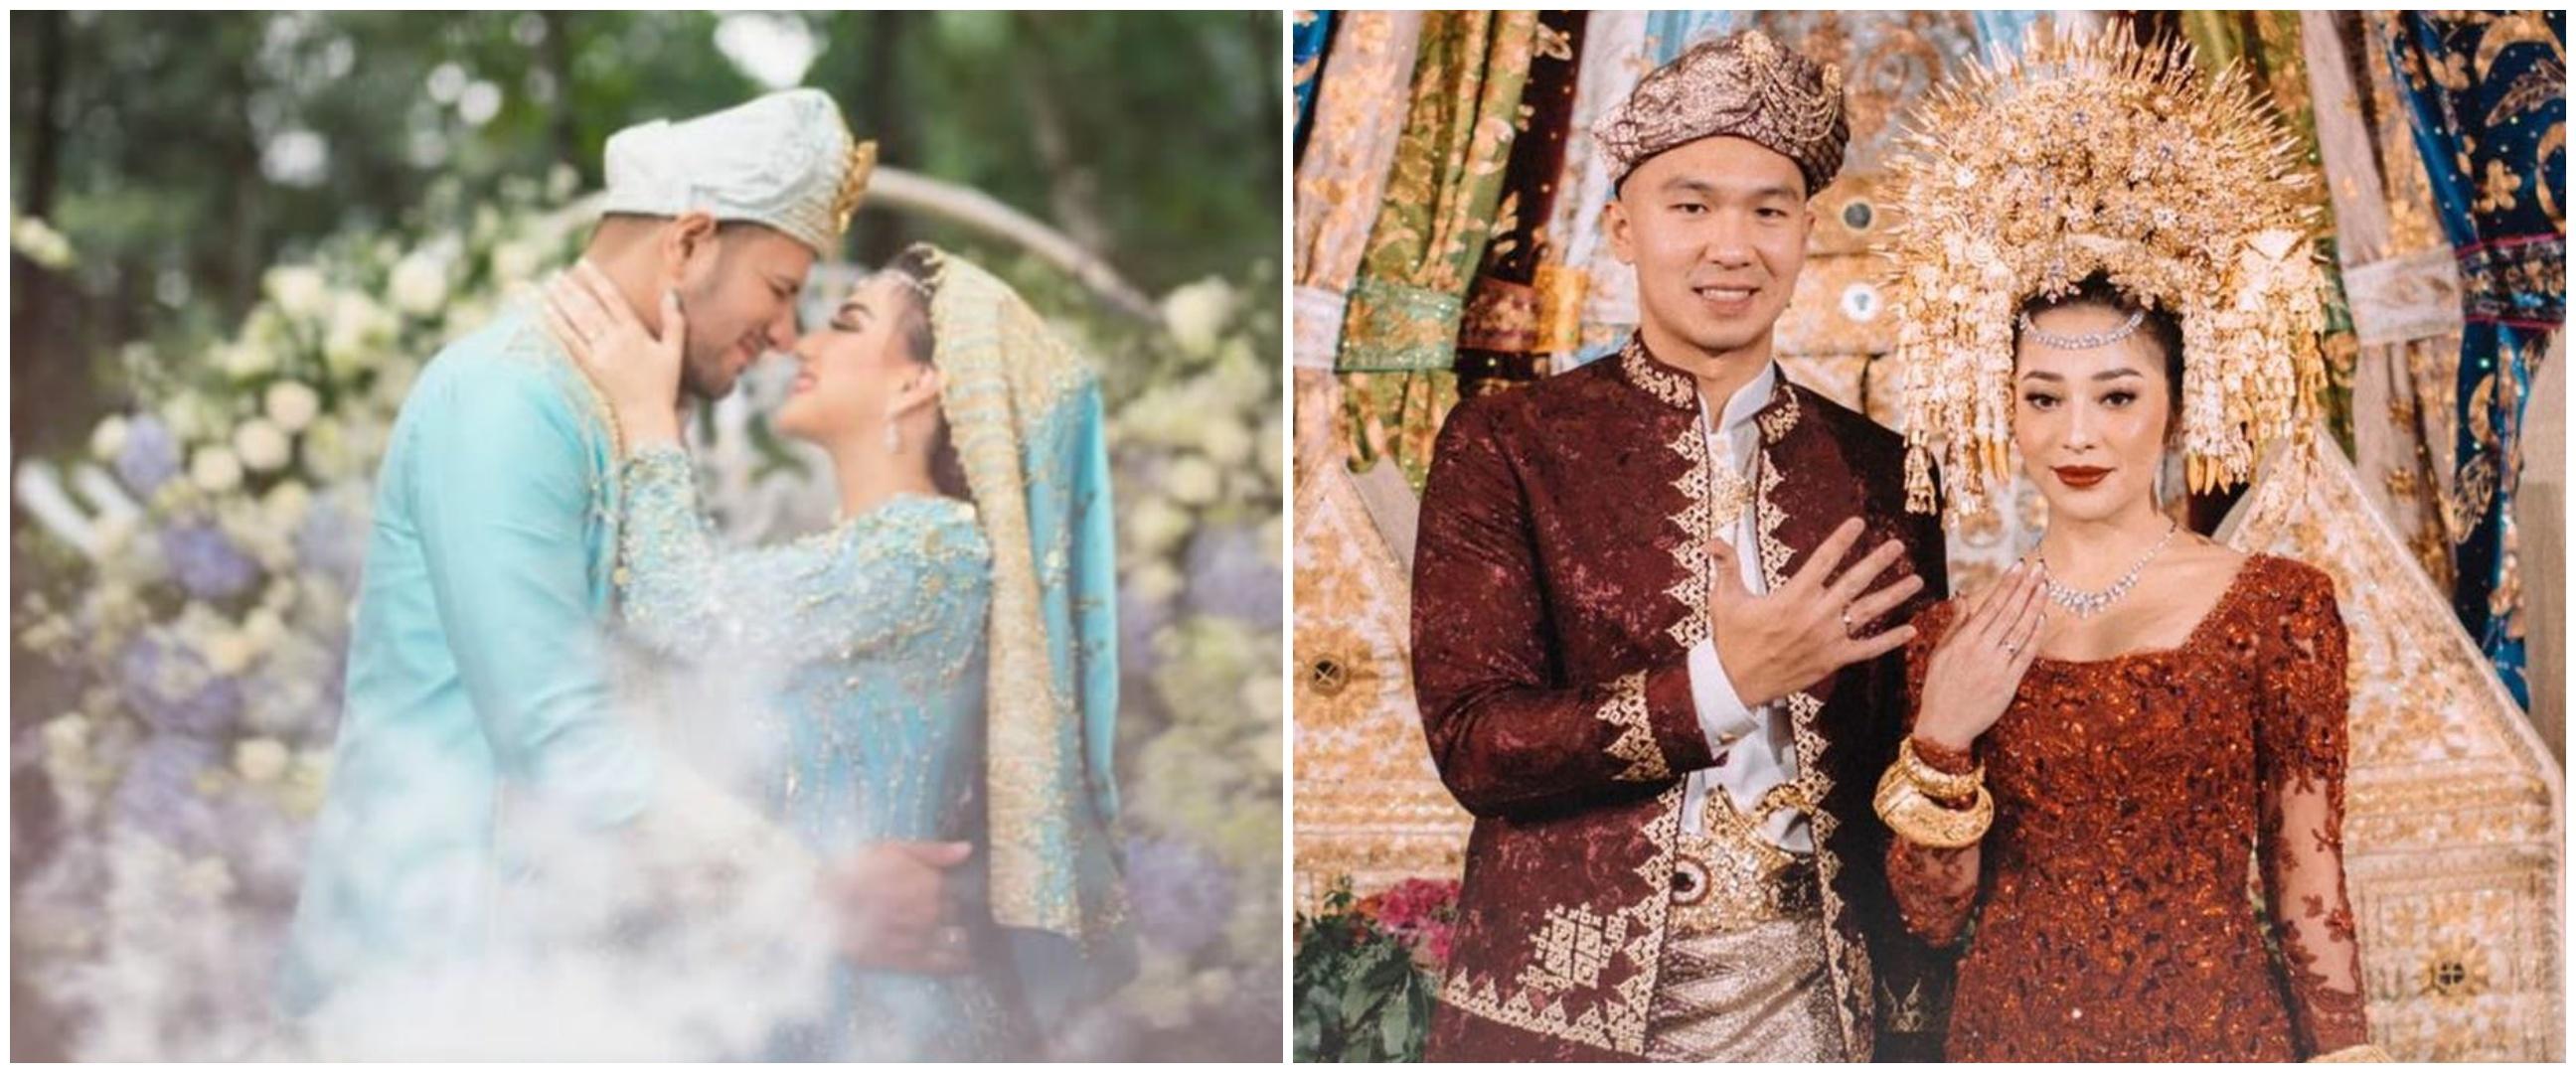 7 Pesinetron menikah dengan adat Minangkabau, terbaru Nikita Willy